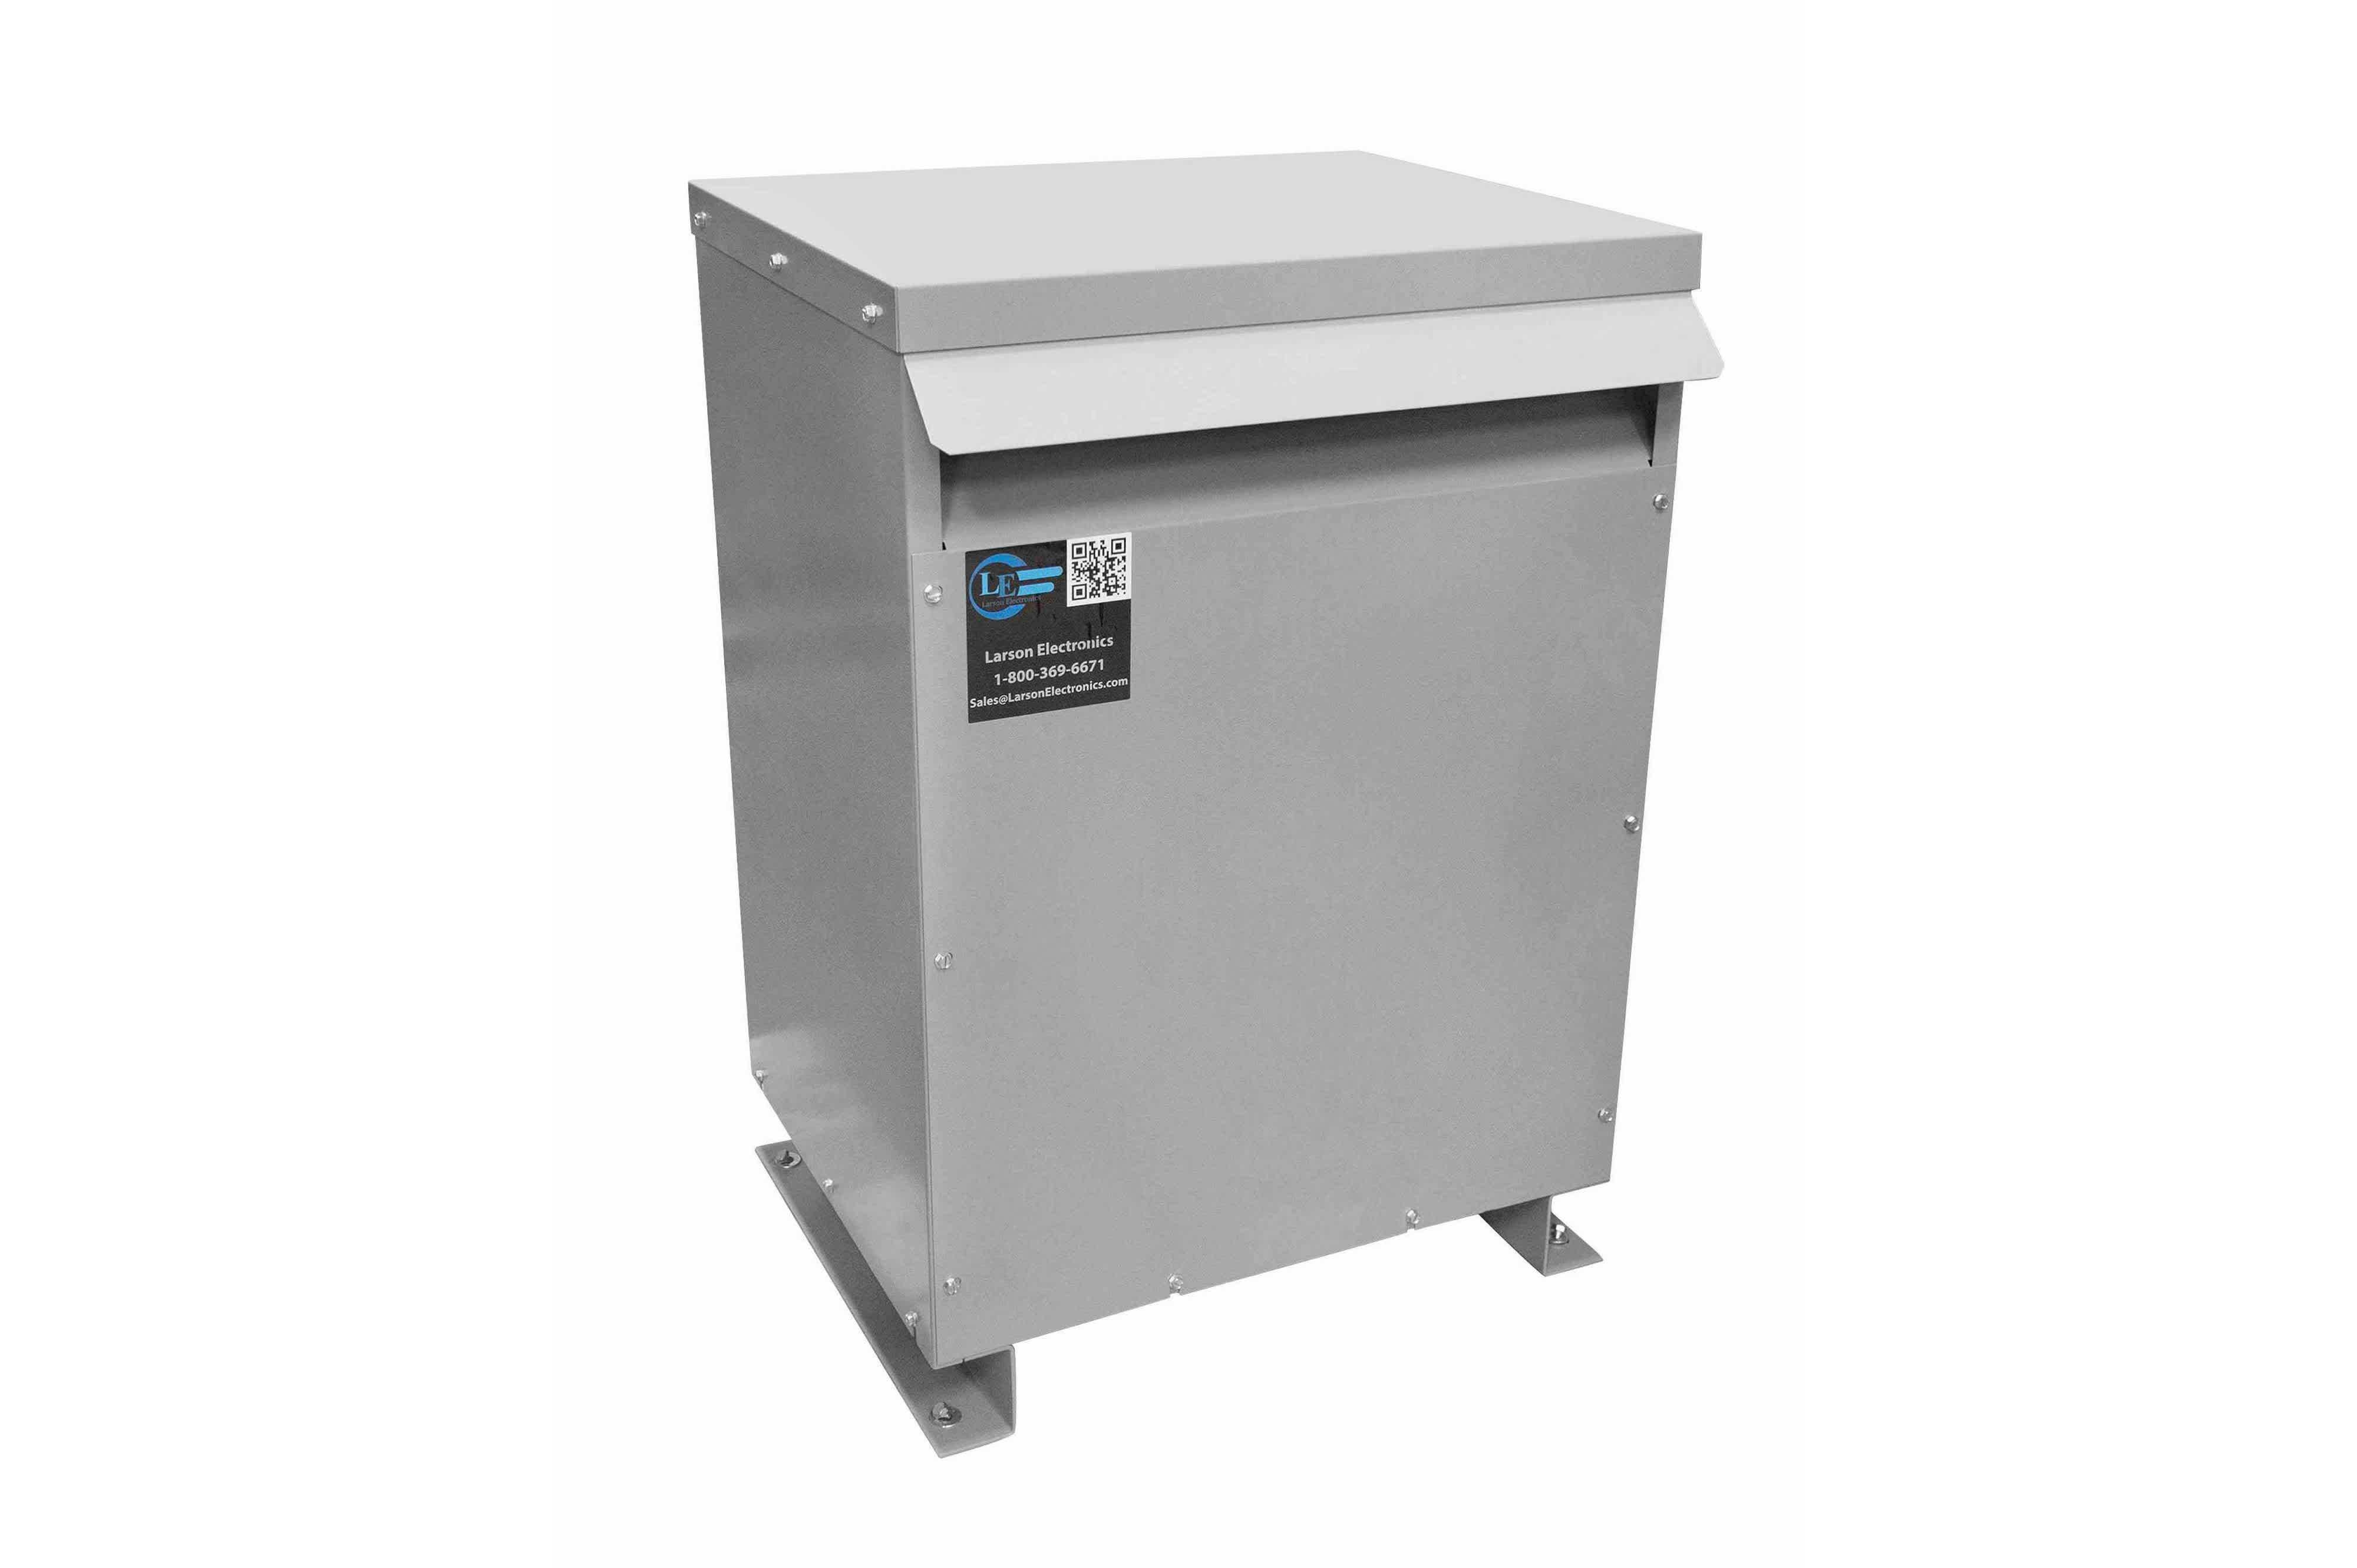 275 kVA 3PH Isolation Transformer, 460V Wye Primary, 240V/120 Delta Secondary, N3R, Ventilated, 60 Hz